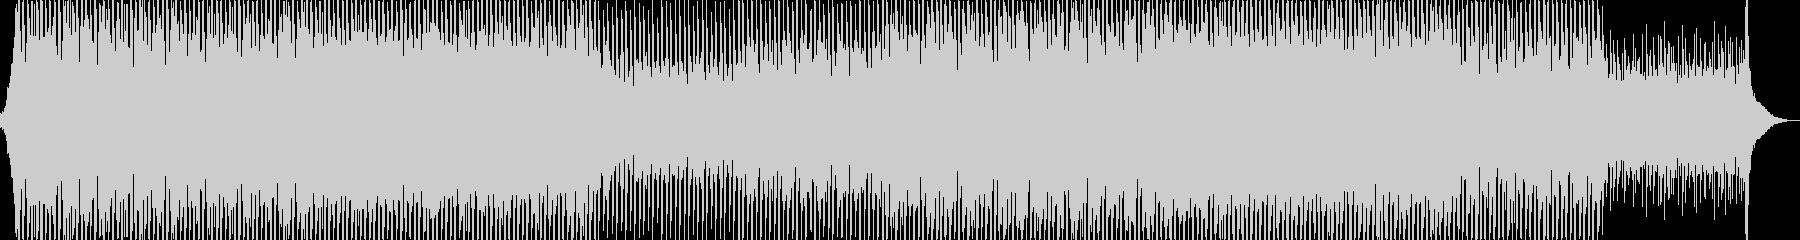 EDMポップで明るく軽快なクラブ系-02の未再生の波形